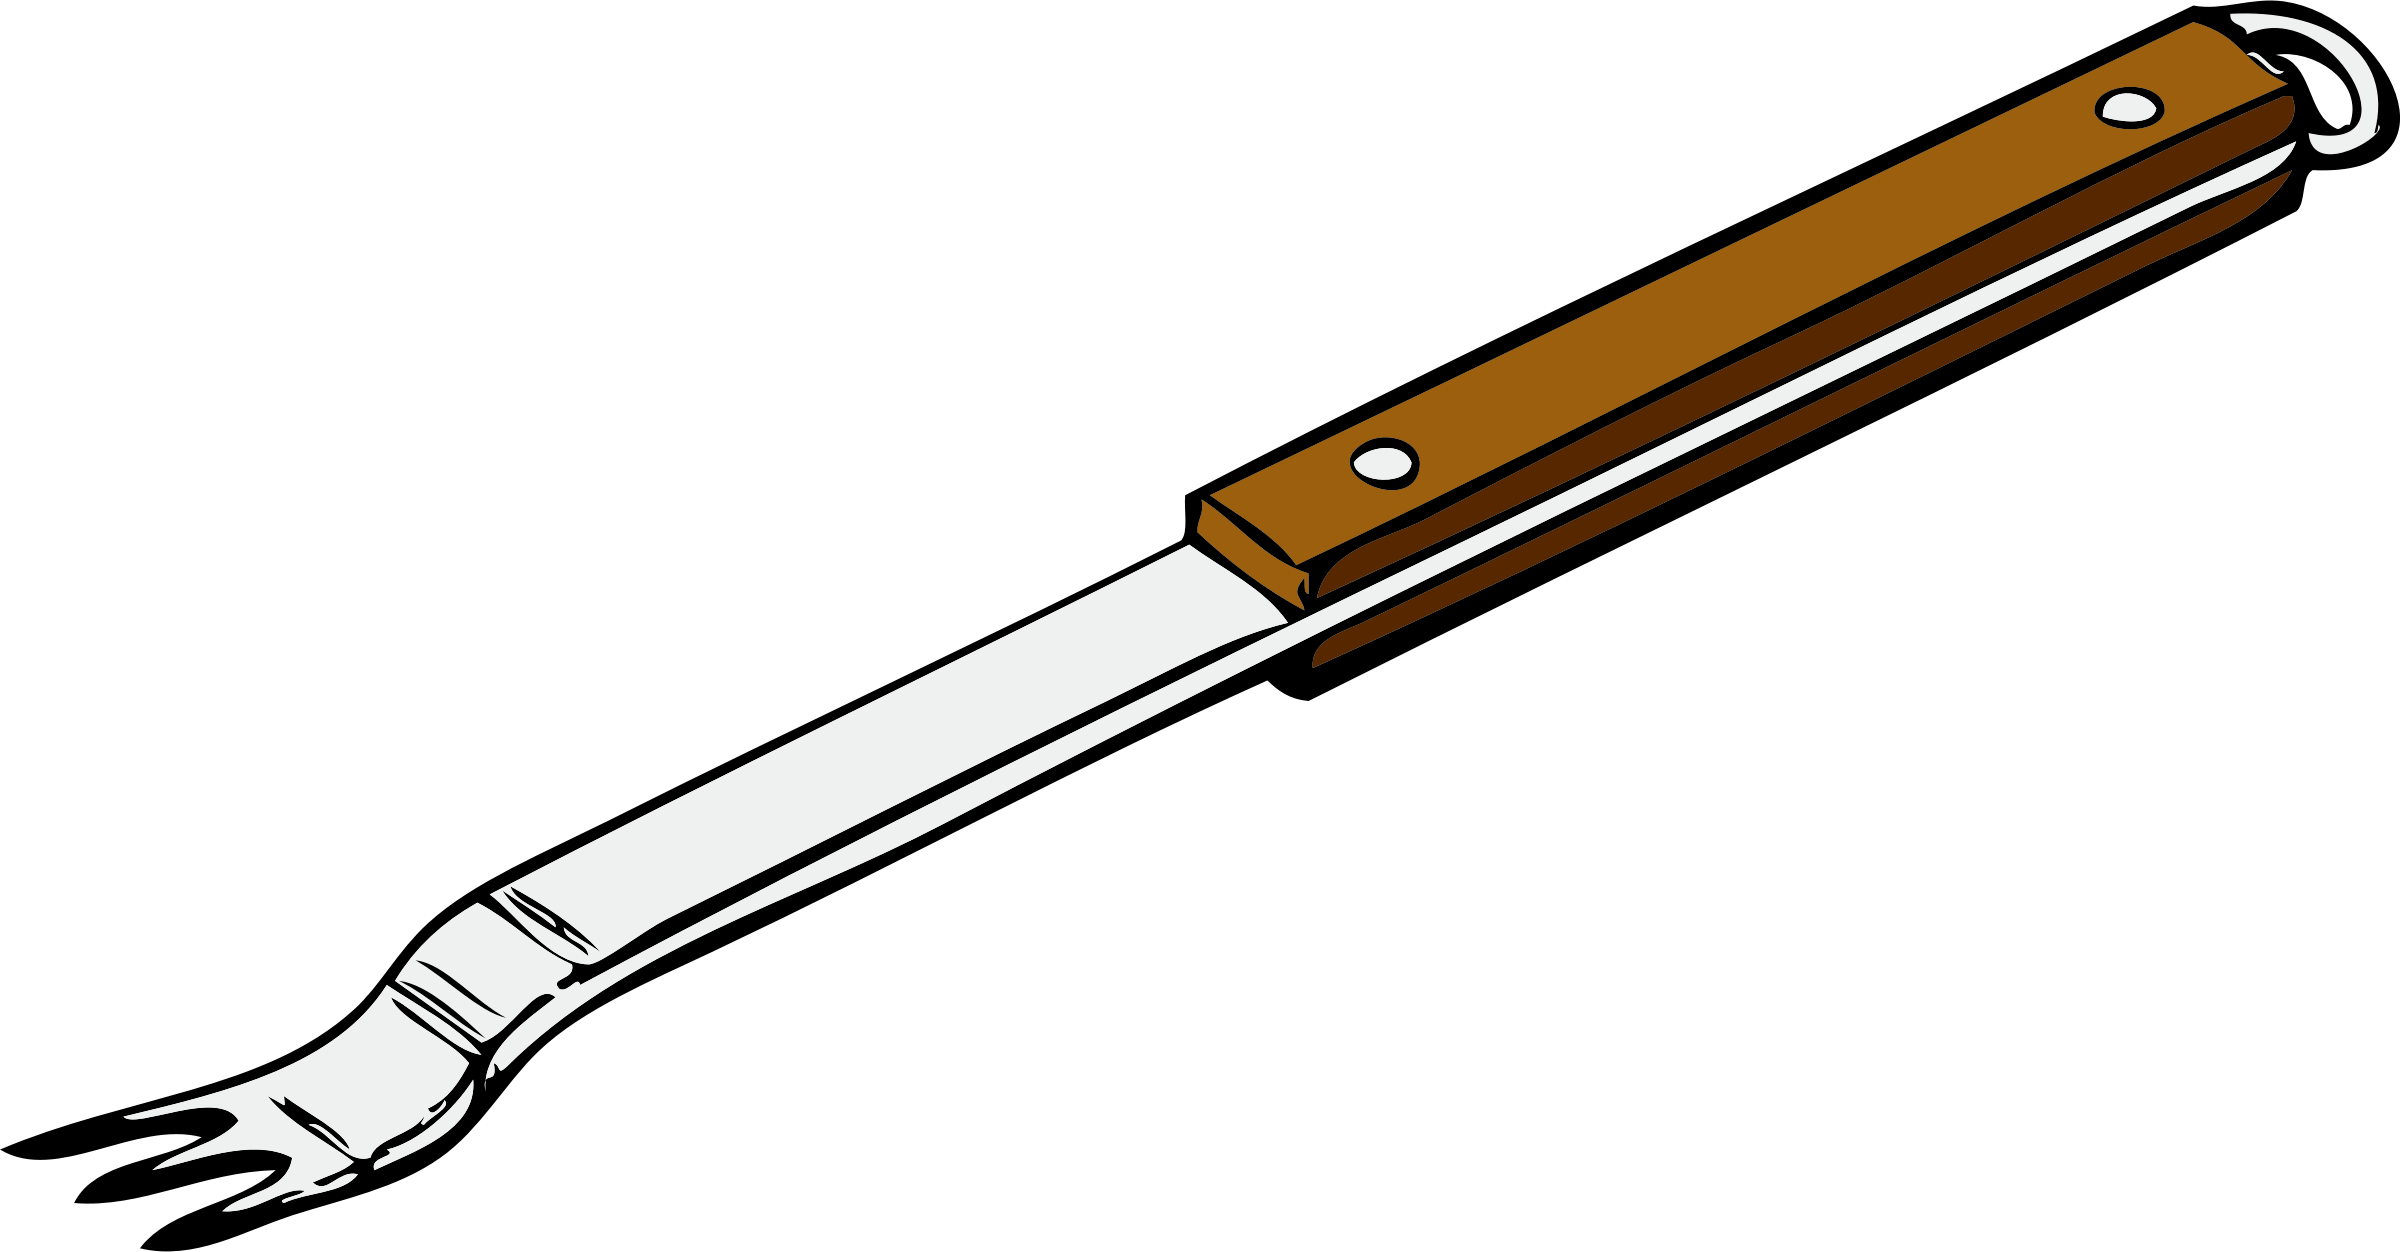 Bbq fork clipart.